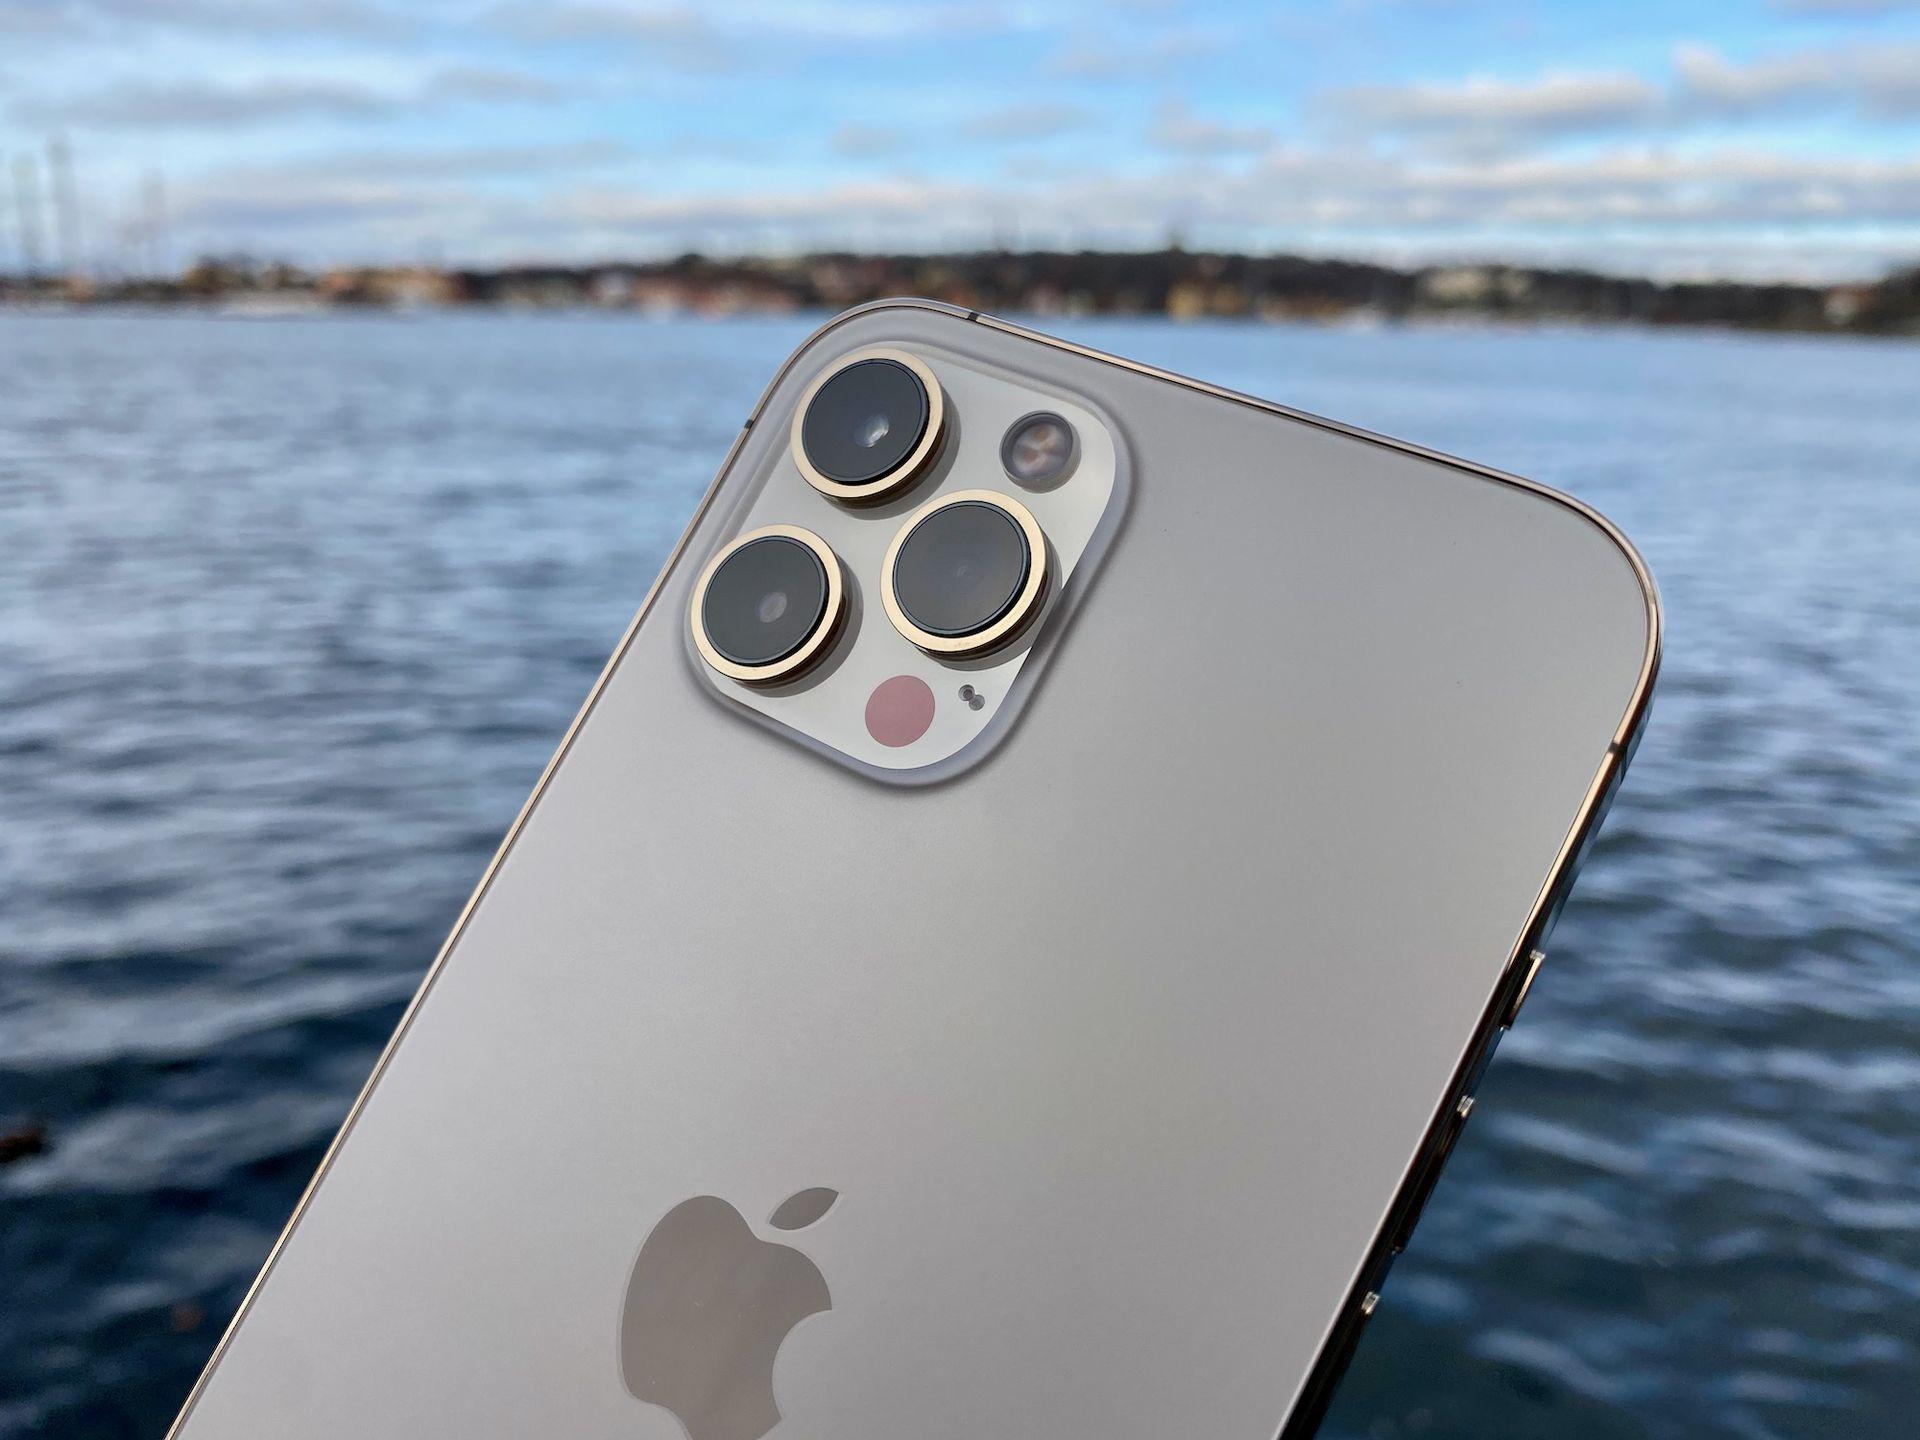 Vi har testat iPhone 12 Pro Max